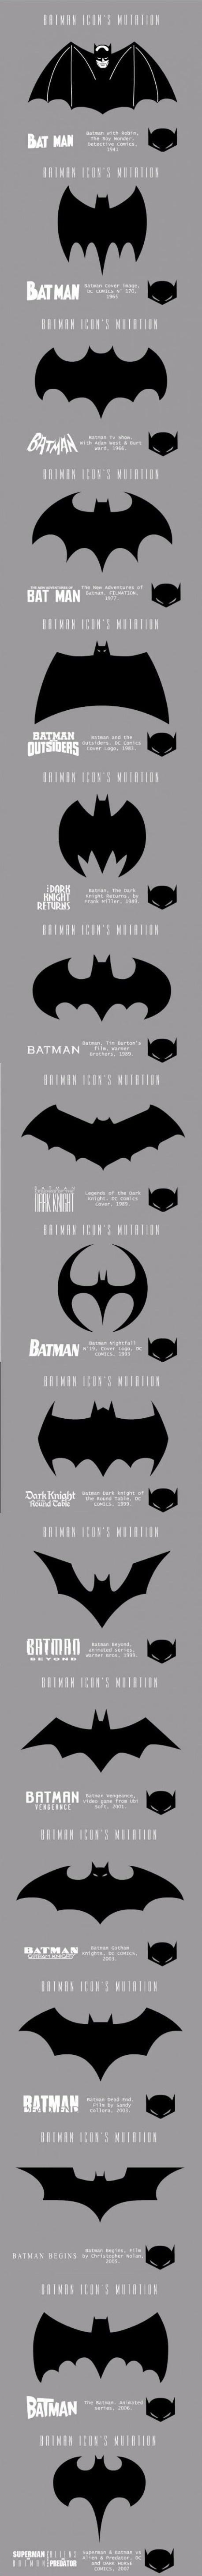 Batman icons mutation